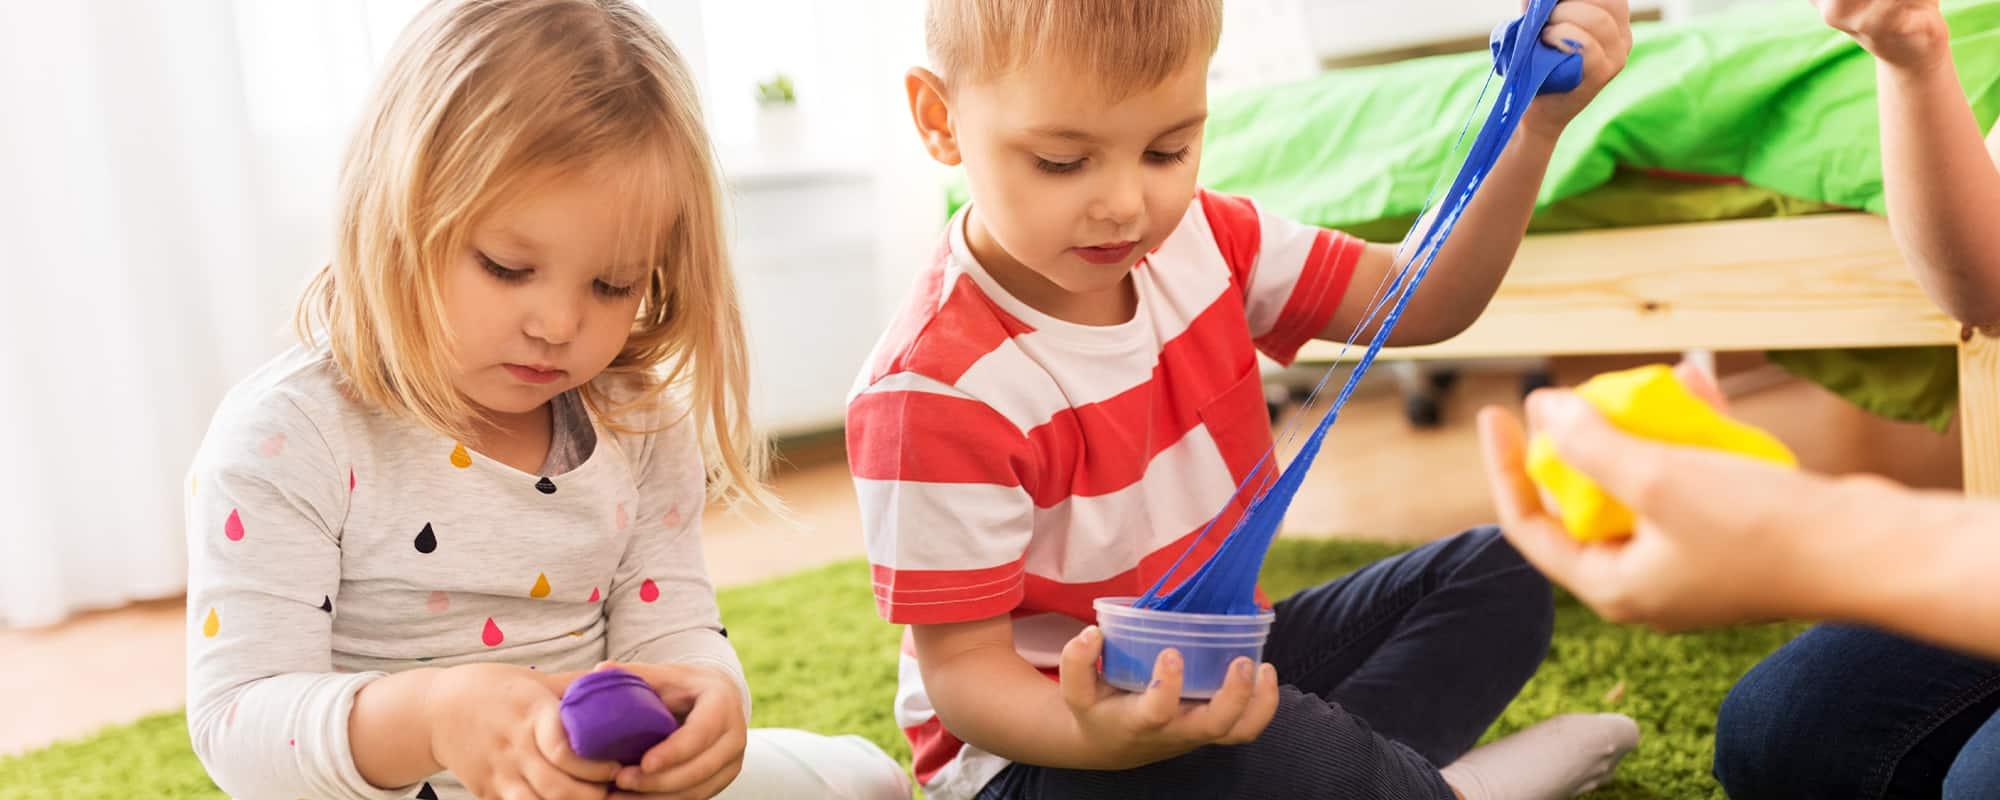 3 Simple Sensory Play Ideas For Kids